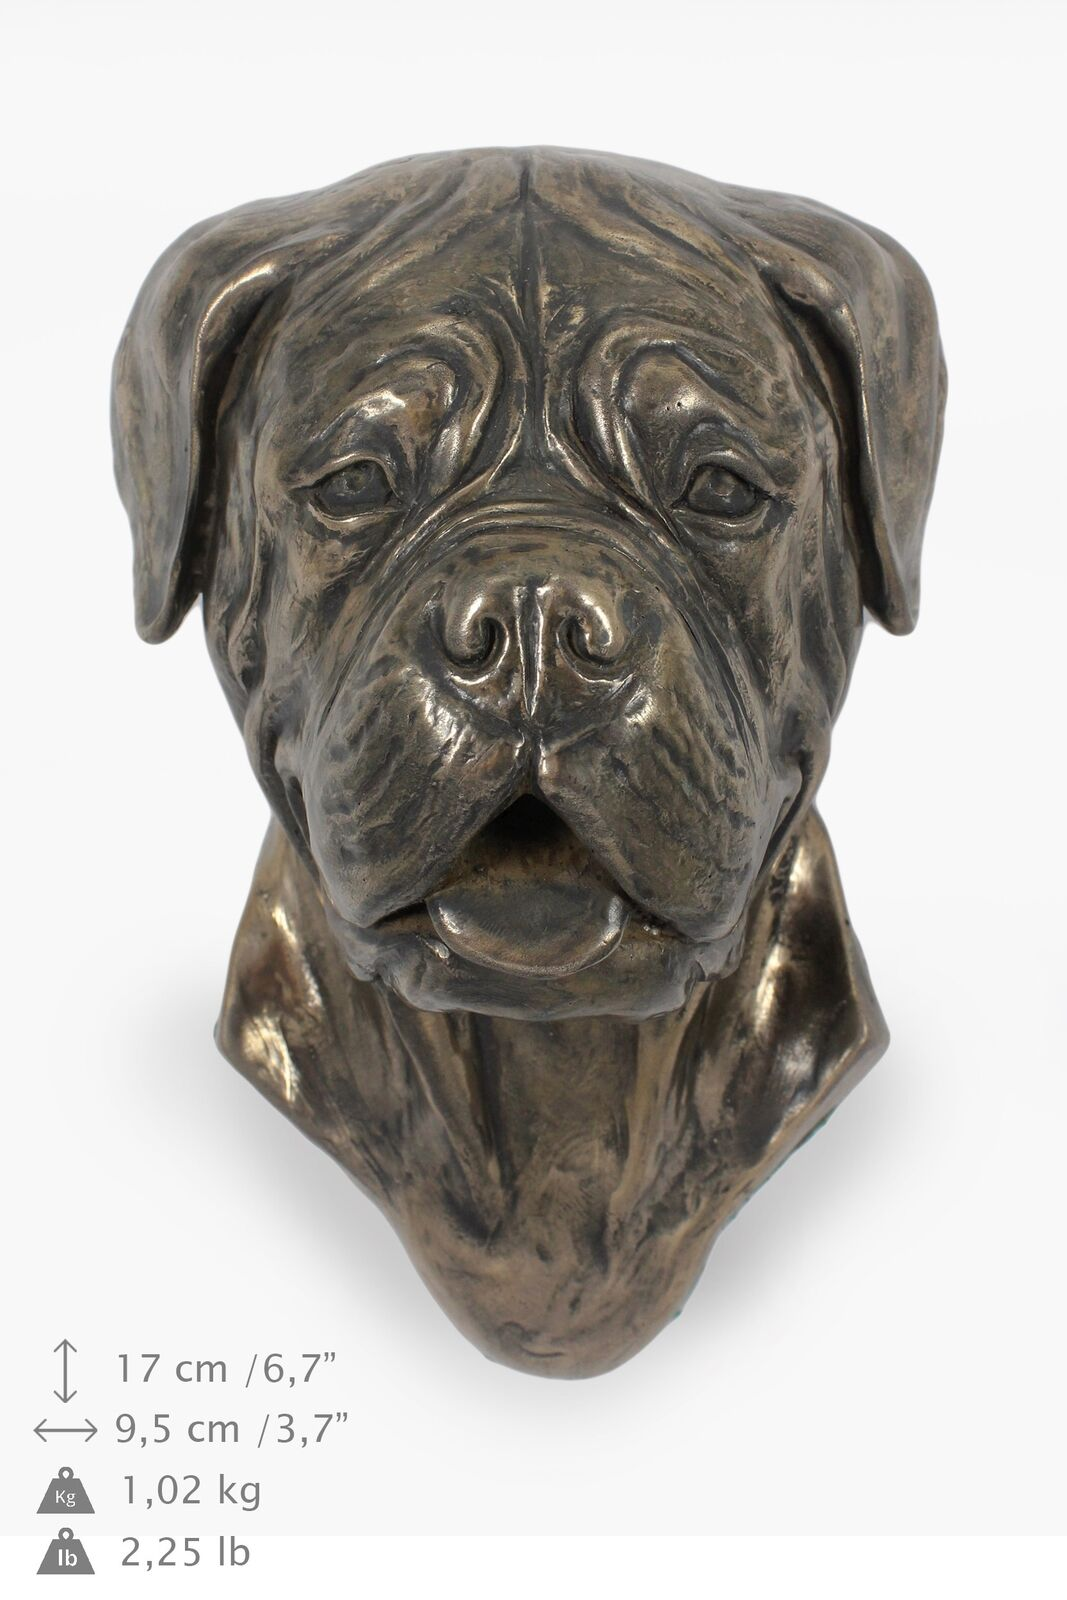 Dog de Bordeaux type 2 - dog figurine to hang on the wall, high quality, Art Dog